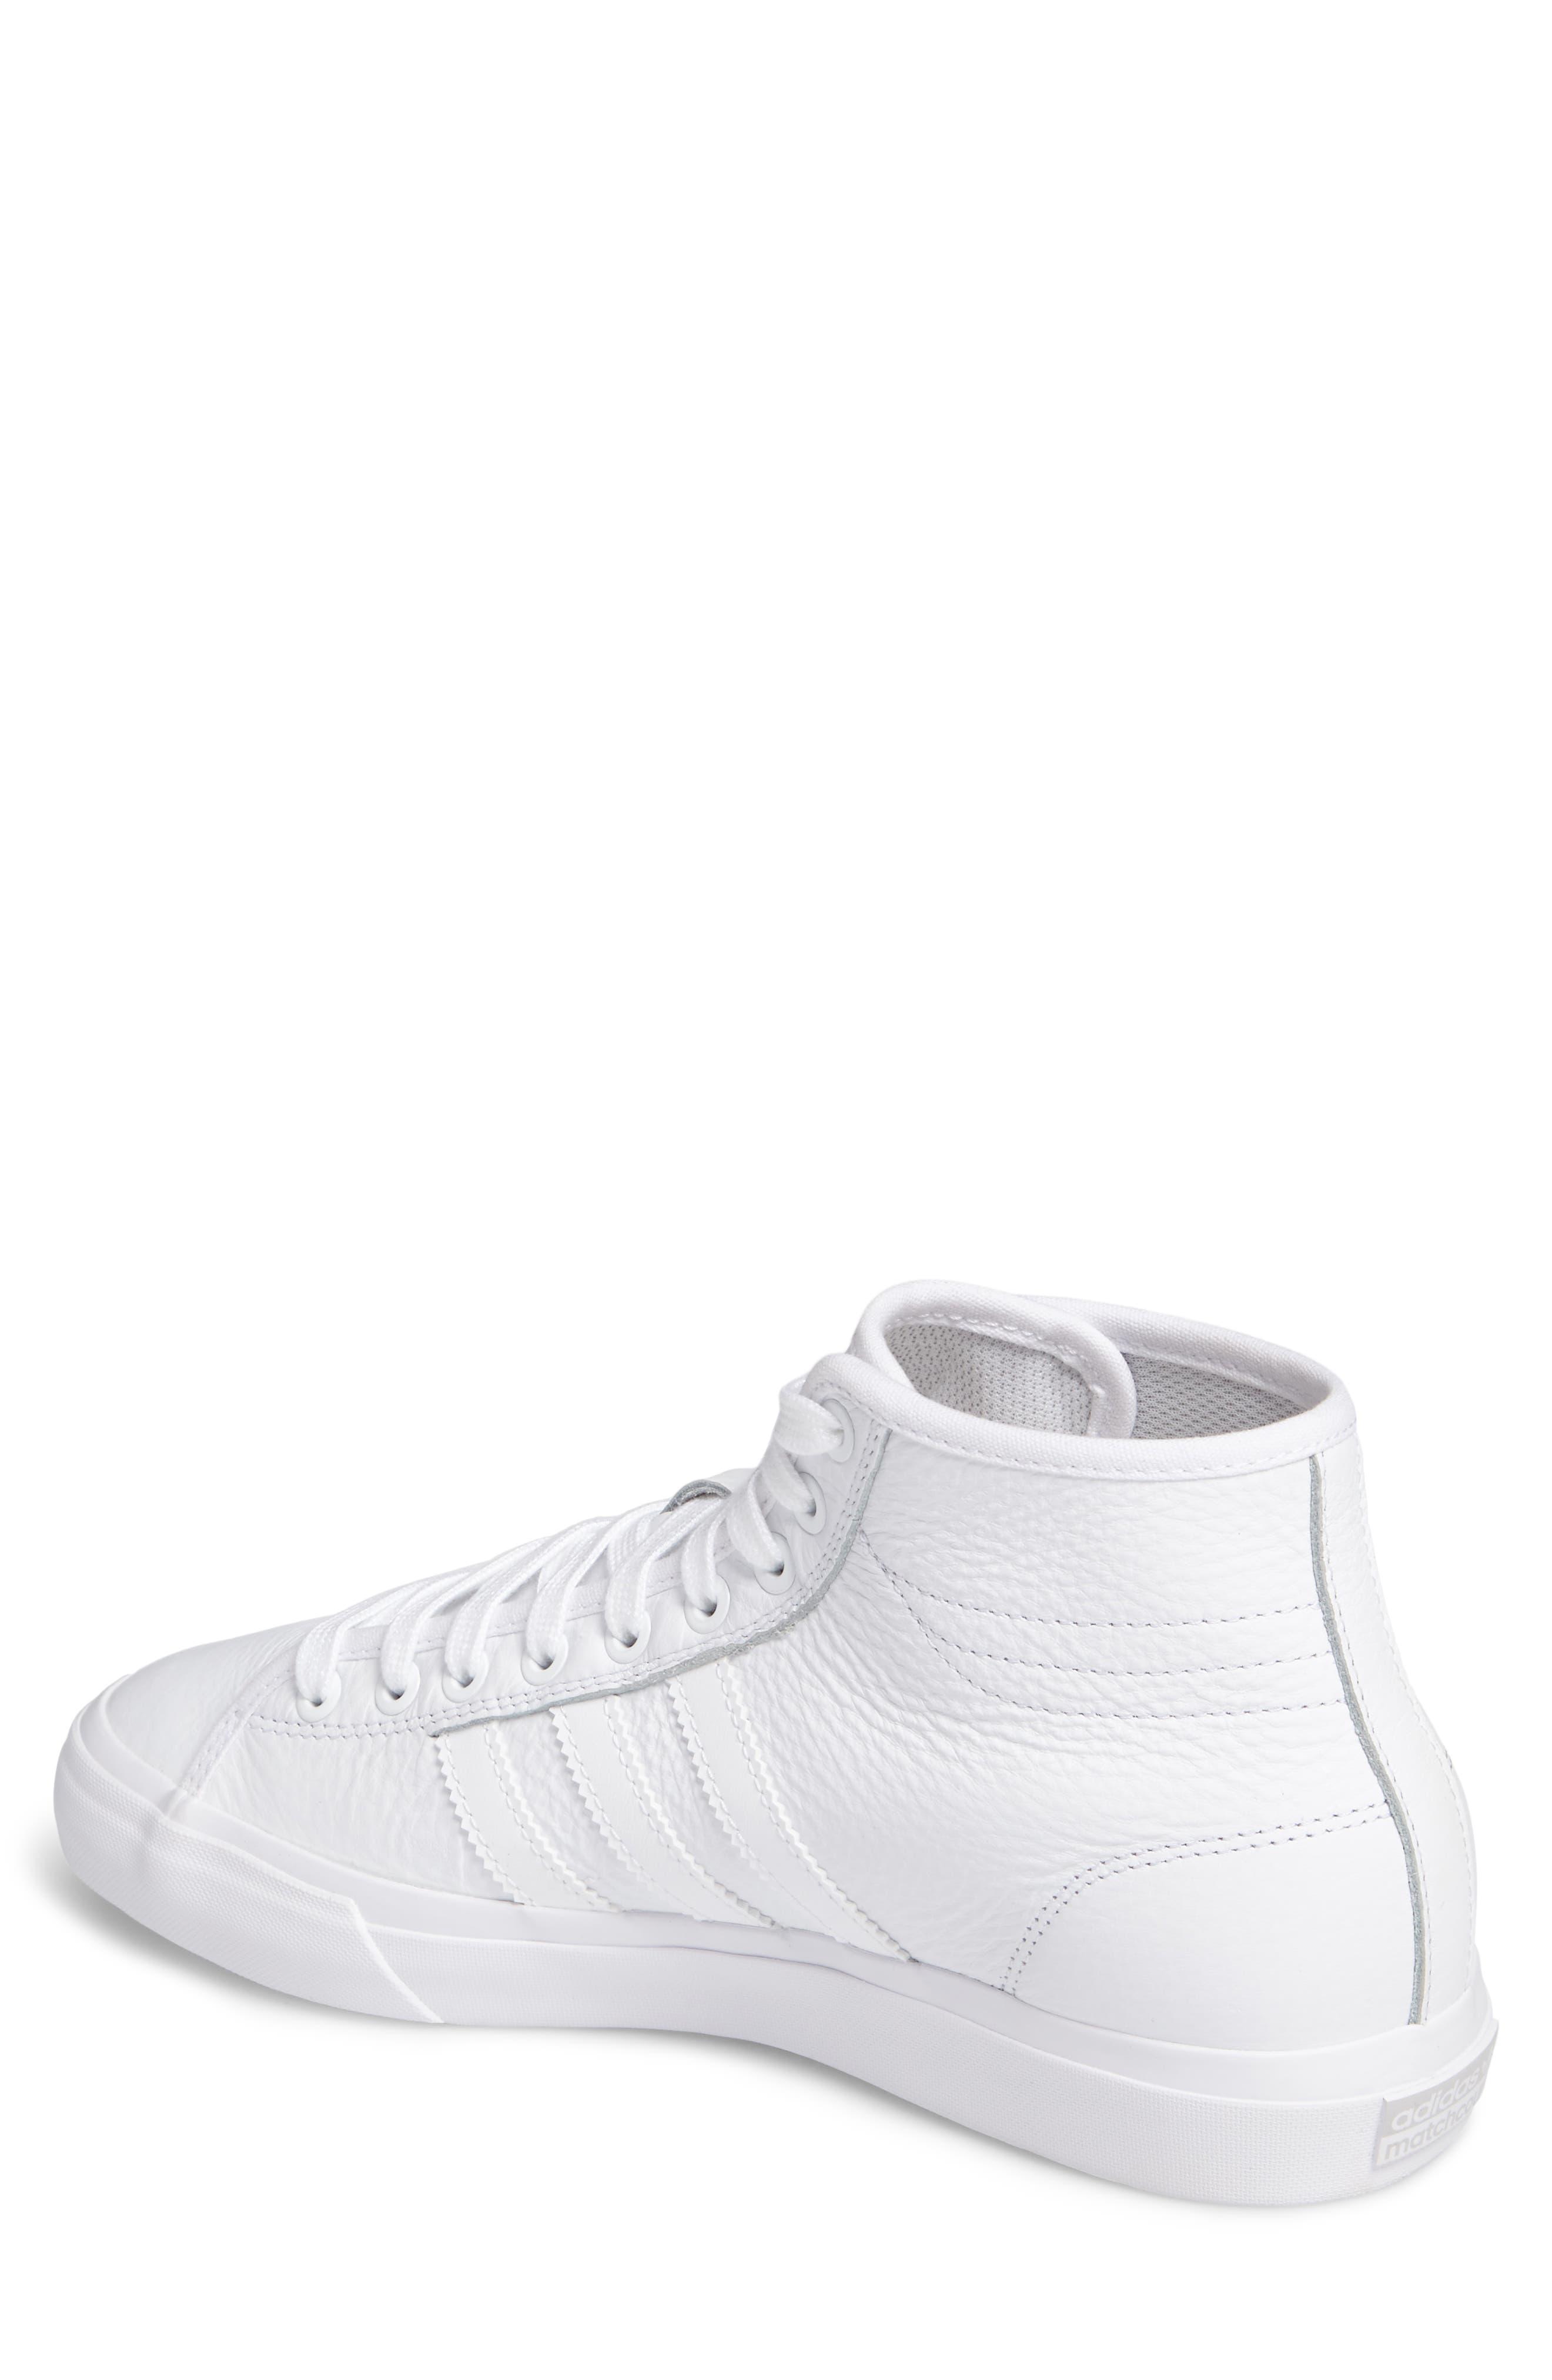 Matchcourt High Top Sneaker,                             Alternate thumbnail 2, color,                             White/ White/ White